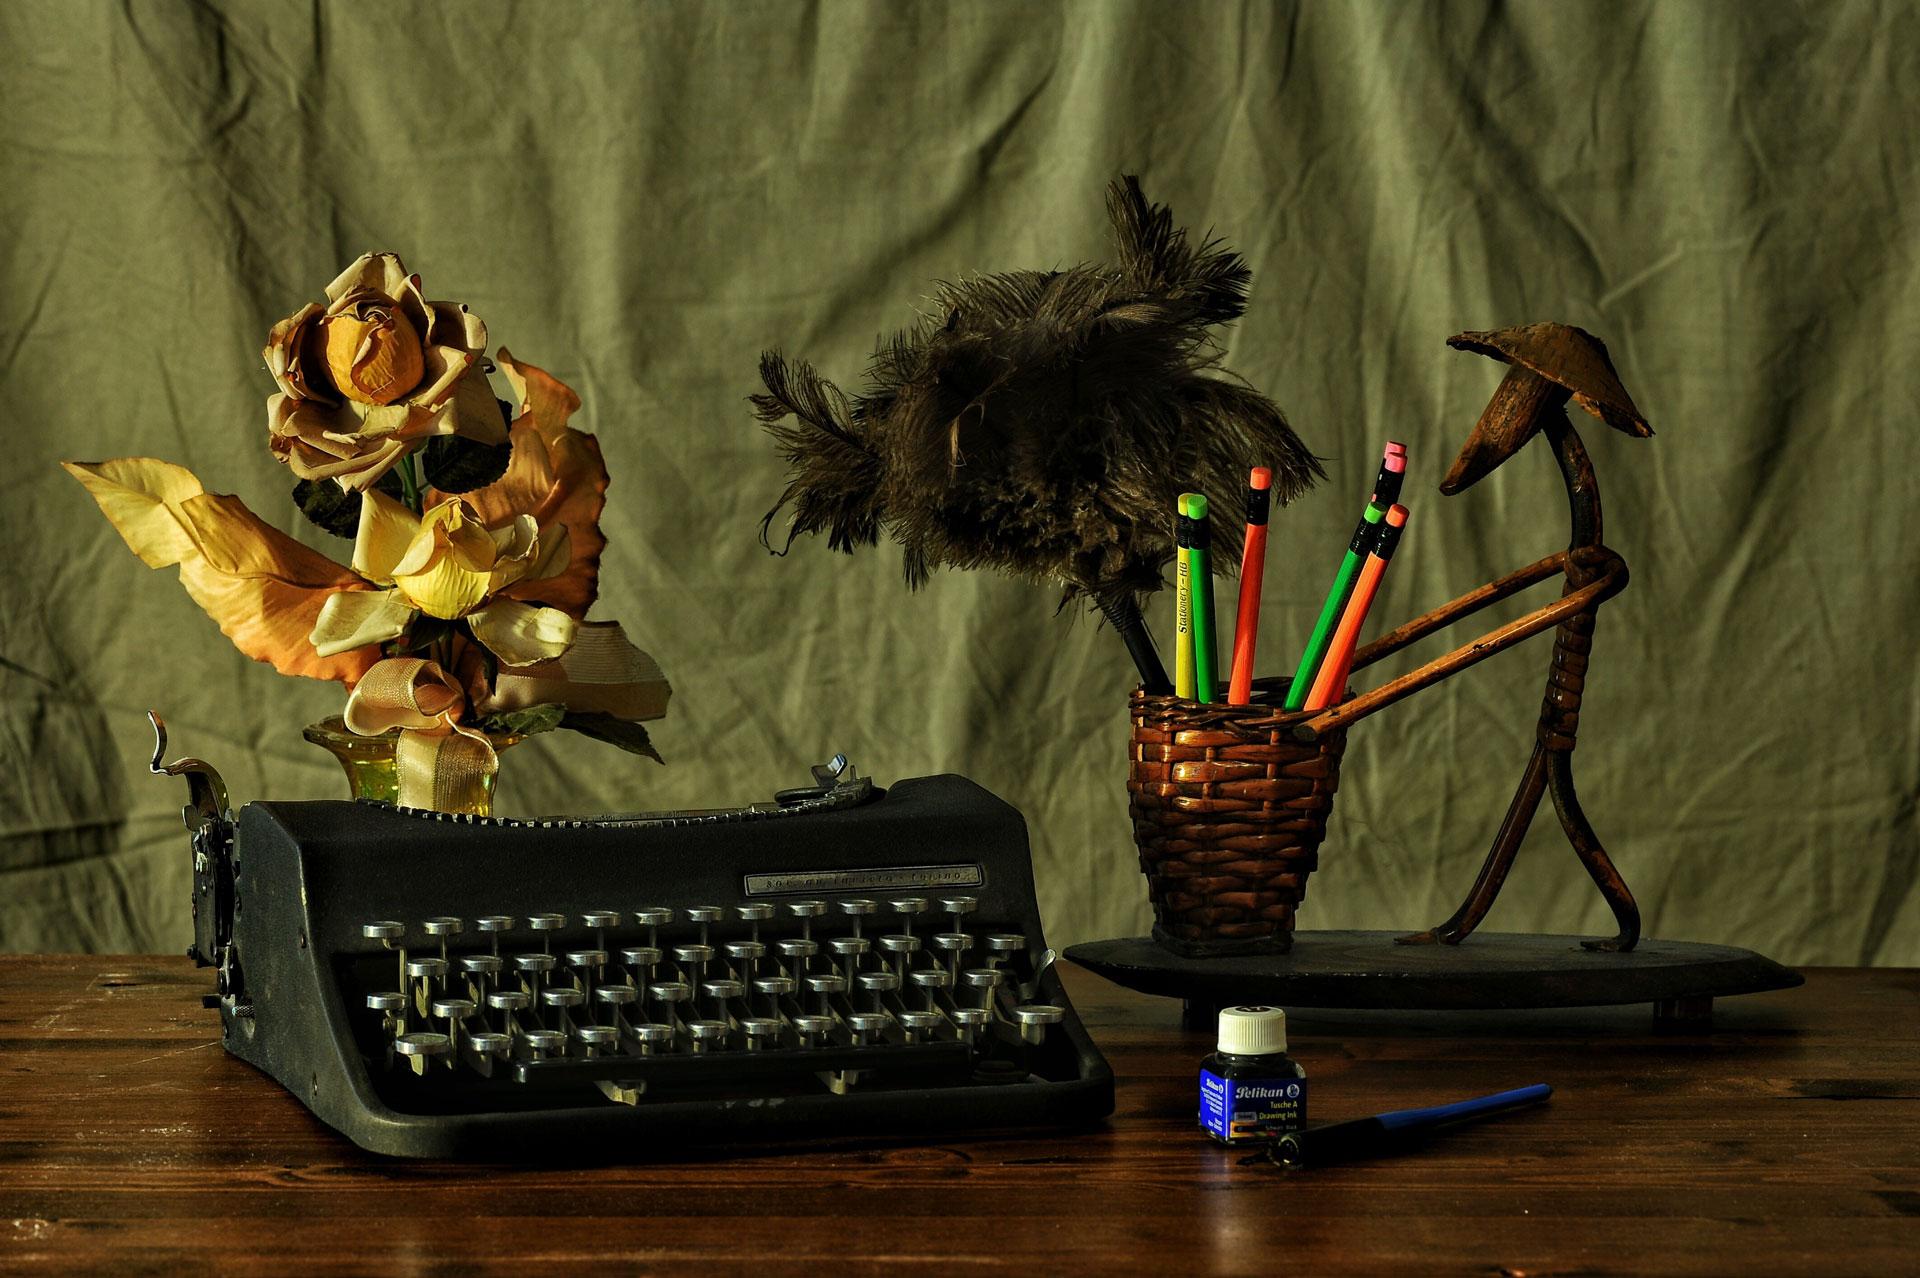 antique-desk-ink-dried-flowers-and-typewriter.jpg